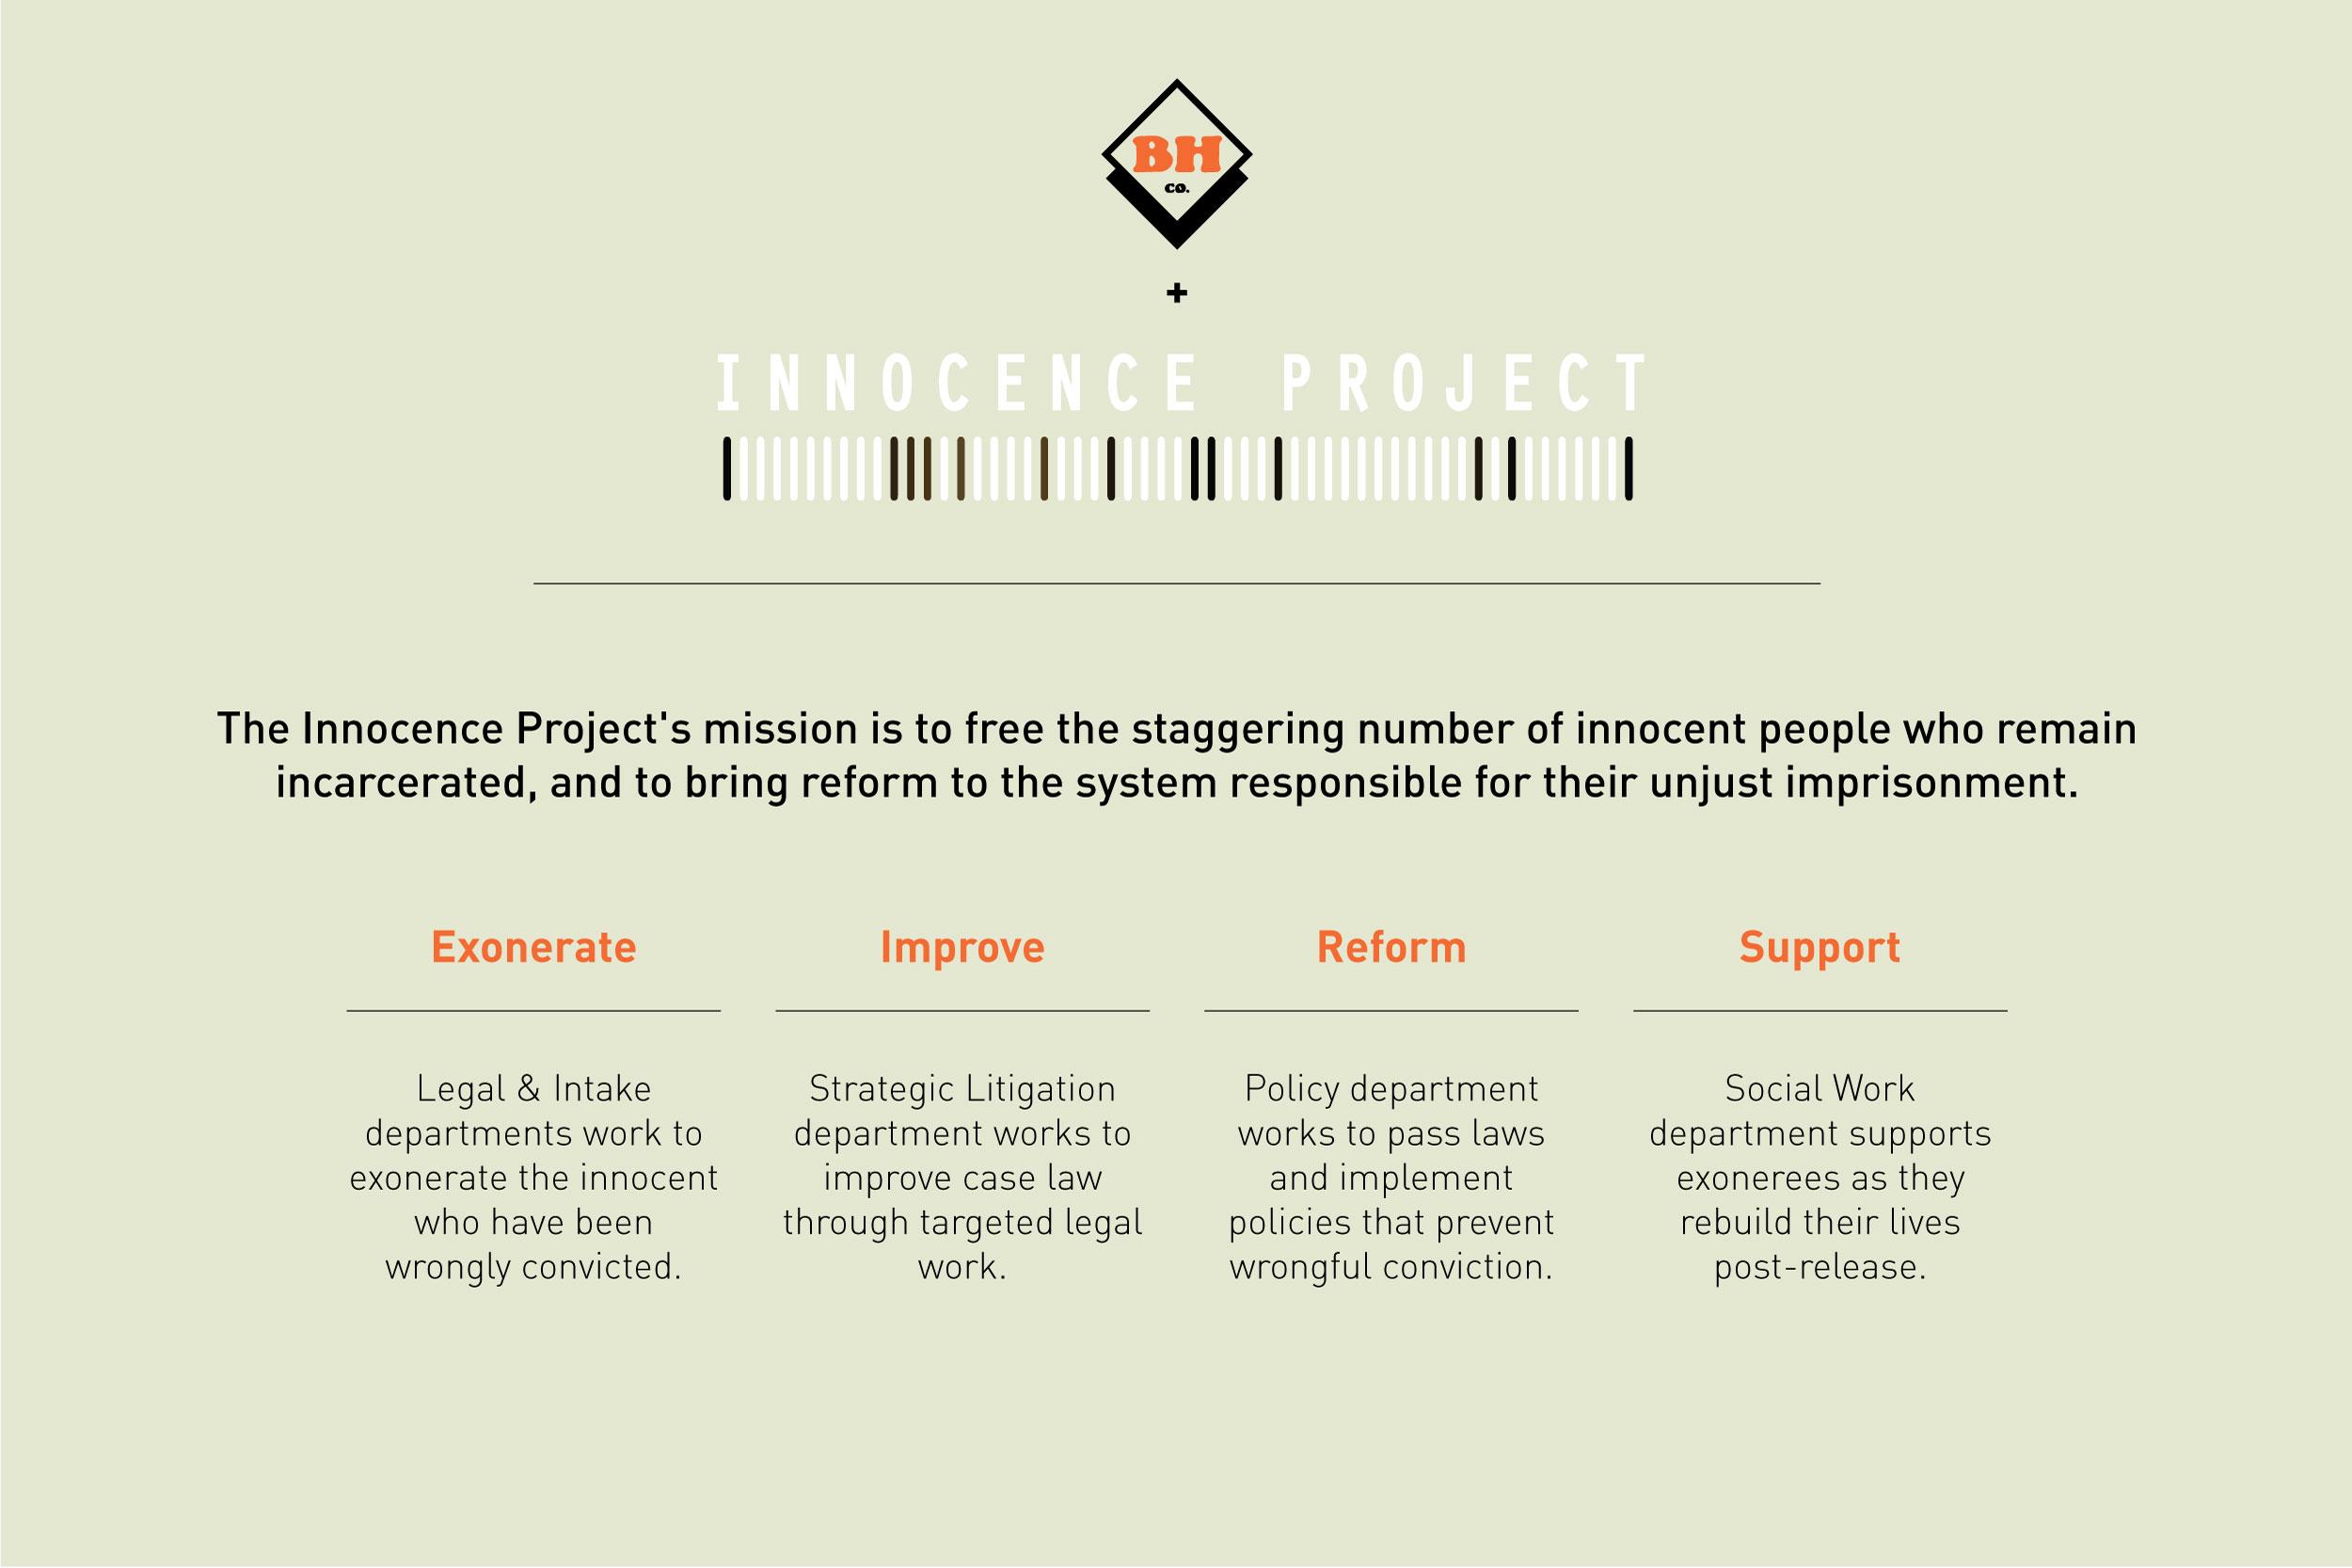 innocenceprojectinfo.jpg